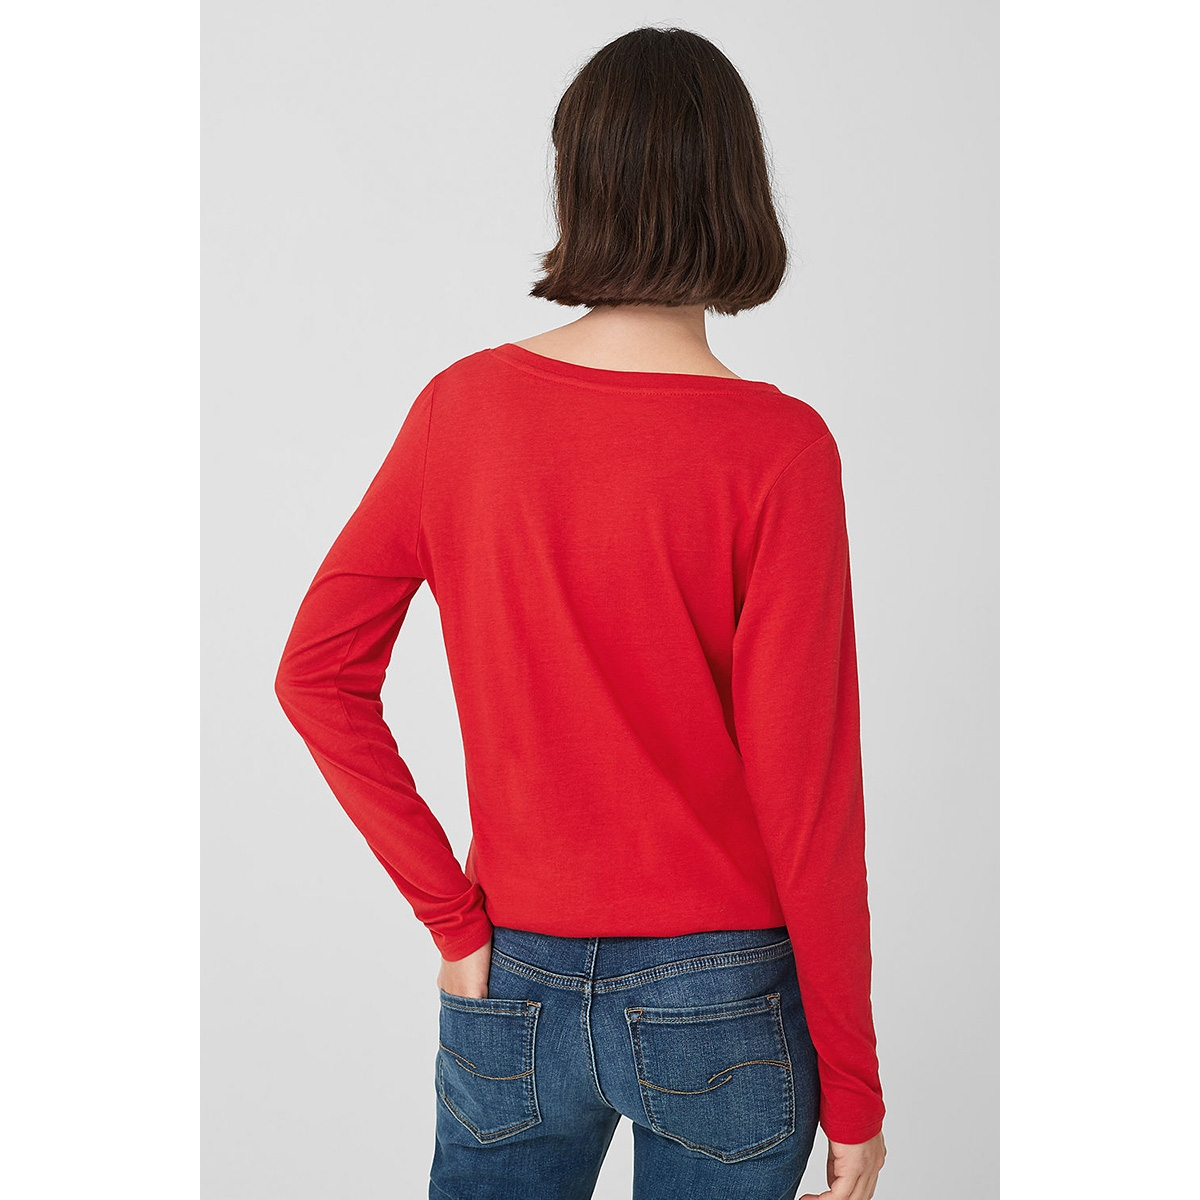 t shirt 41909318353 q/s designed by t-shirt 3123